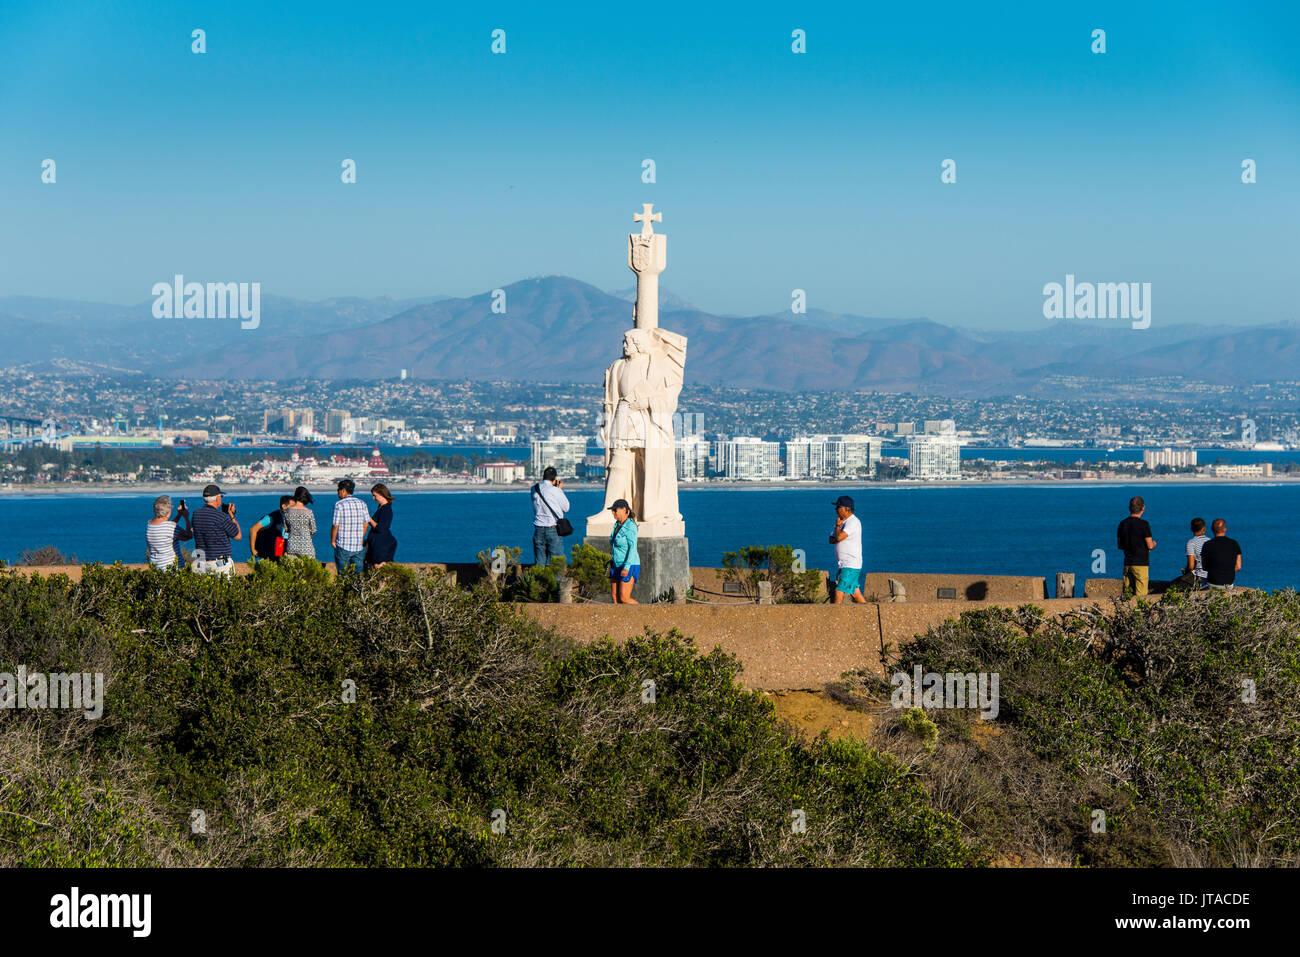 Cabrillo estatua, Monumento Nacional Cabrillo, Point Loma, en San Diego, California, Estados Unidos de América, América del Norte Imagen De Stock